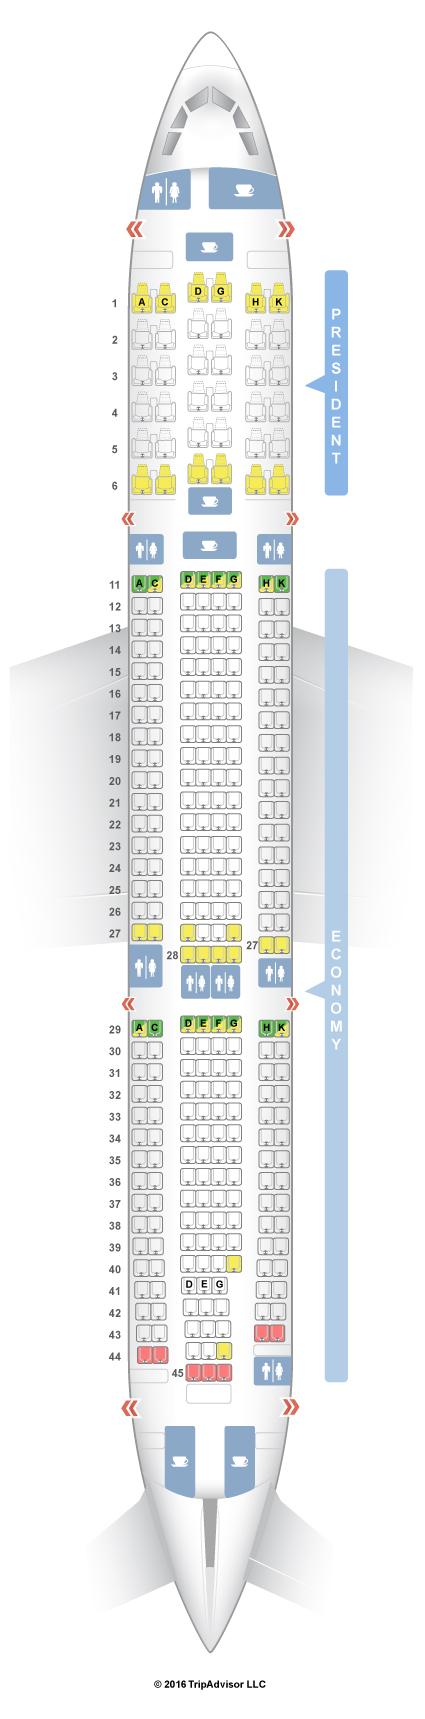 A330 300 Seat Map SeatGuru Seat Map Aeroflot